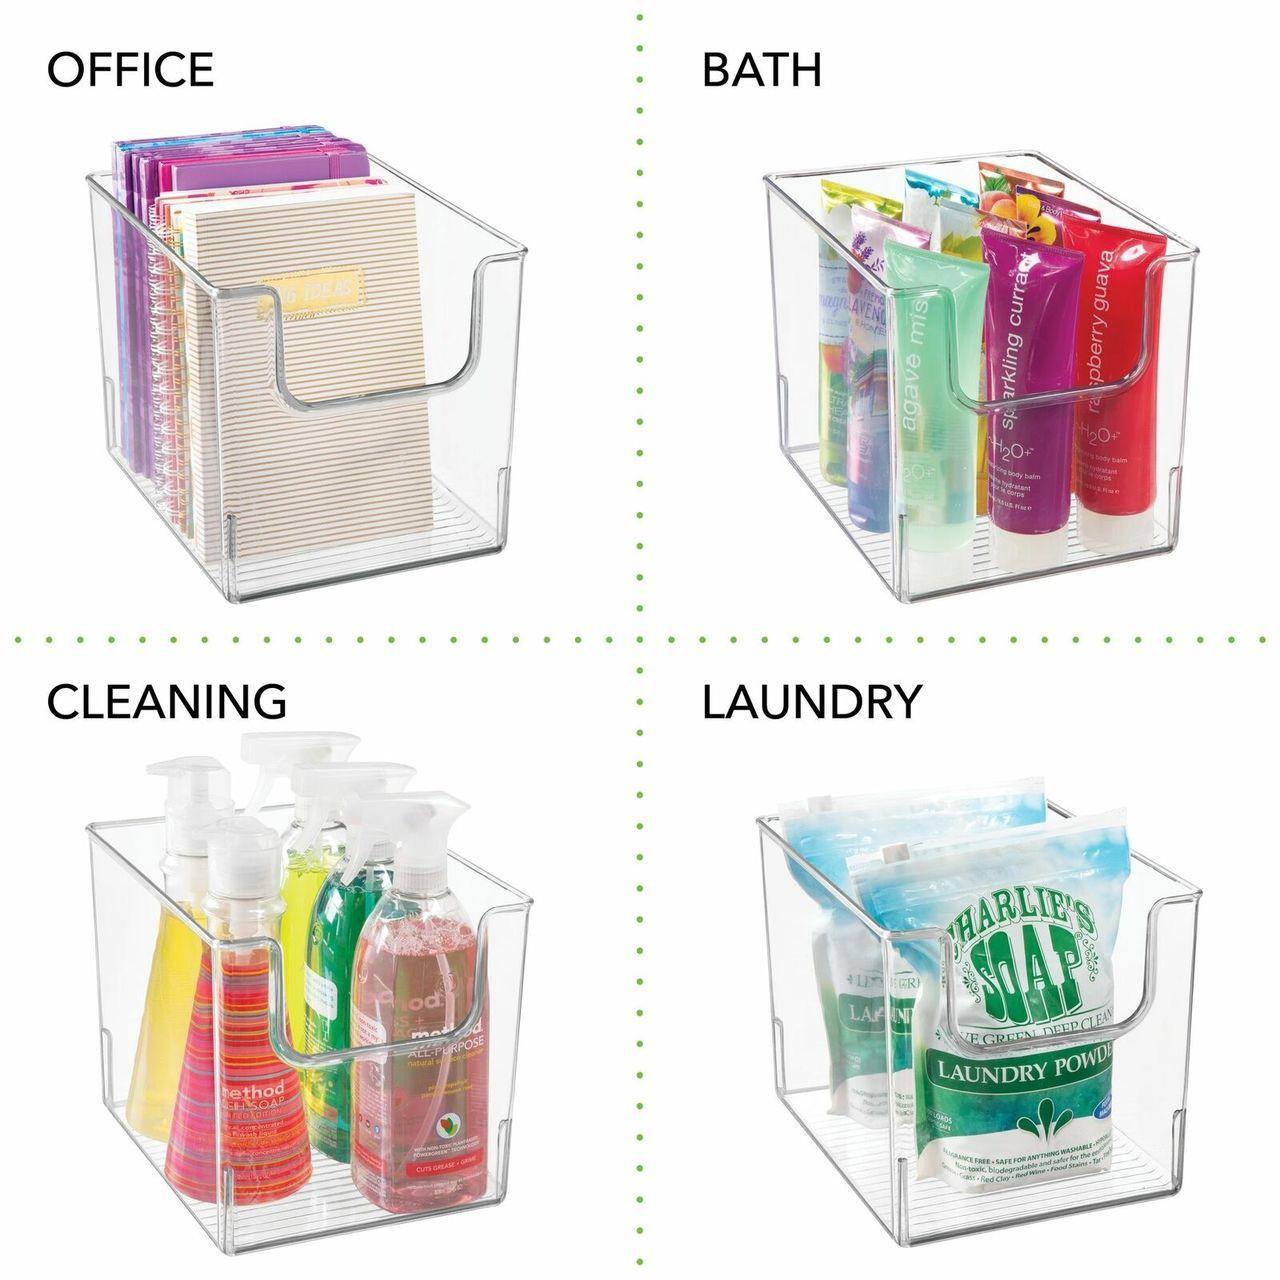 Wide Plastic Bathroom Vanity Storage Organizer Bin 10 X 8 X 7 75 In 2020 Bathroom Vanity Storage Food Storage Organization Home Office Storage